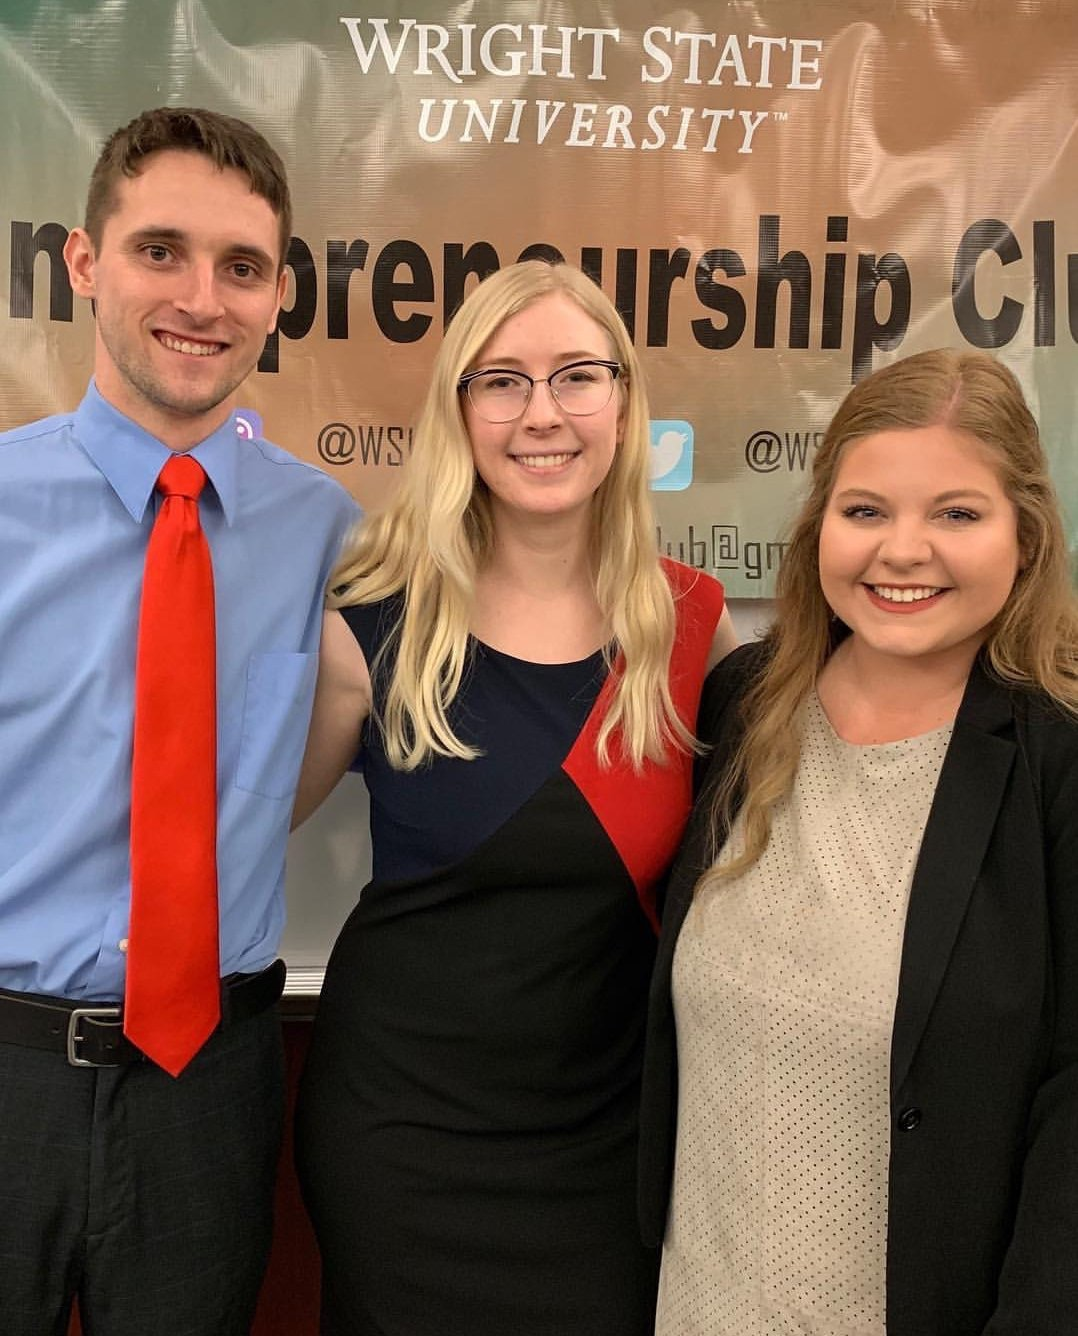 Group photo is courtesy of Sarah Marsh. Taken by Entrepreneurship Club.